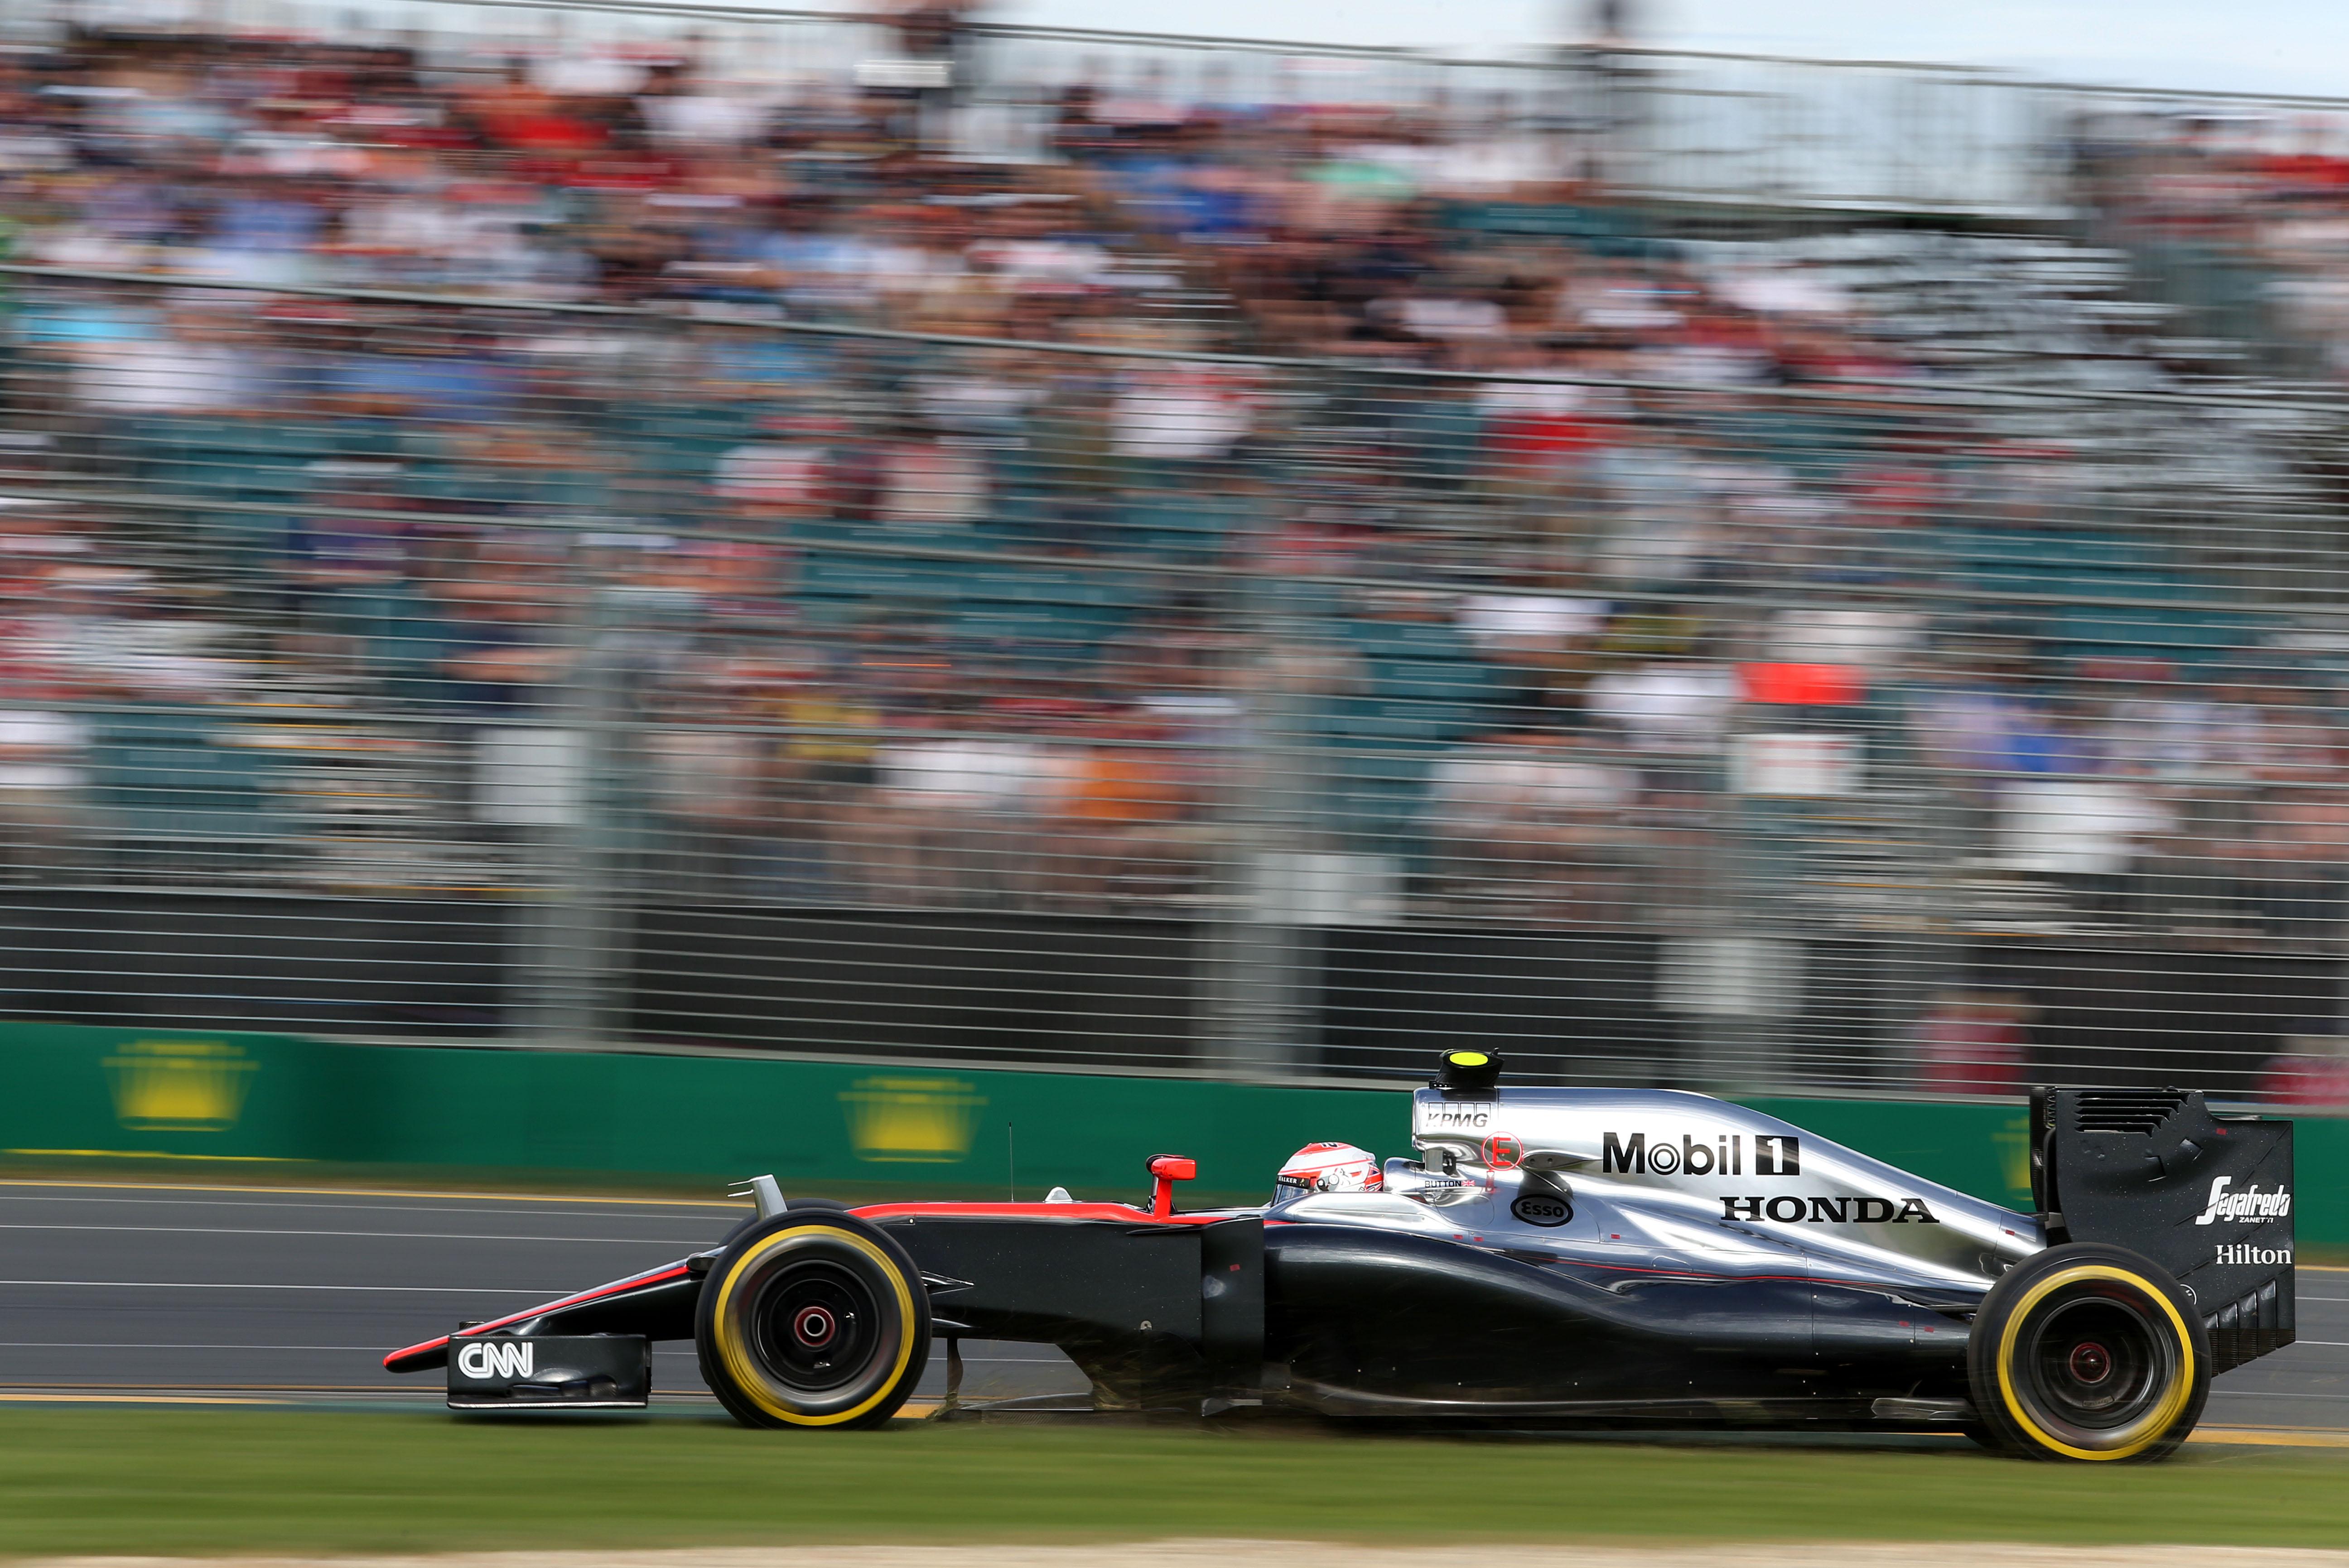 Jenson Button McLaren Australian Grand Prix 2015 Melbourne